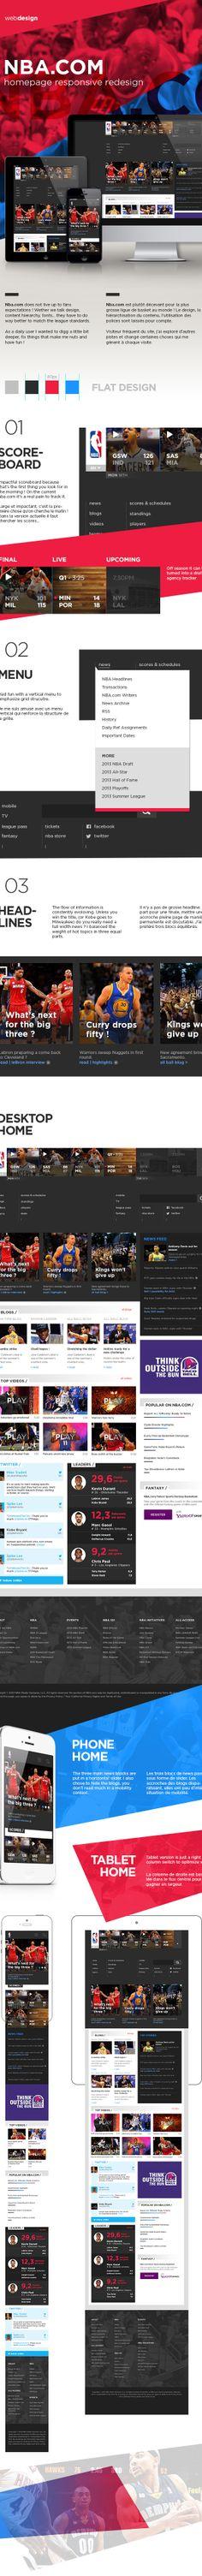 Nba.com redesign on Behance